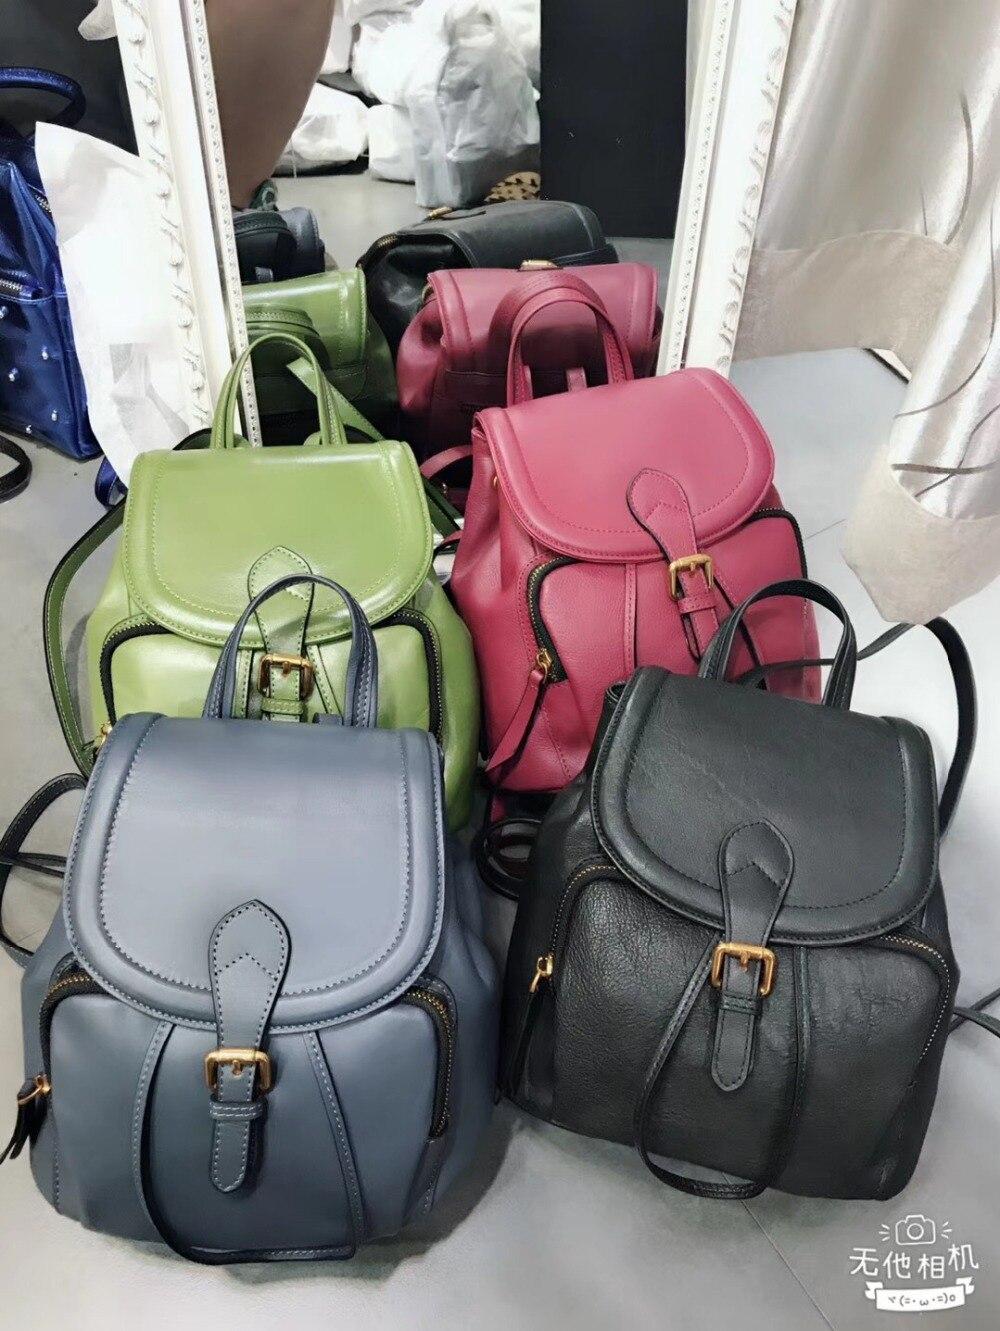 kafunila 100% genuine leather backpack women bags famous brand designer female shoulder bags fashion 2018 new backpack for women домкрат autoprofi dg 06